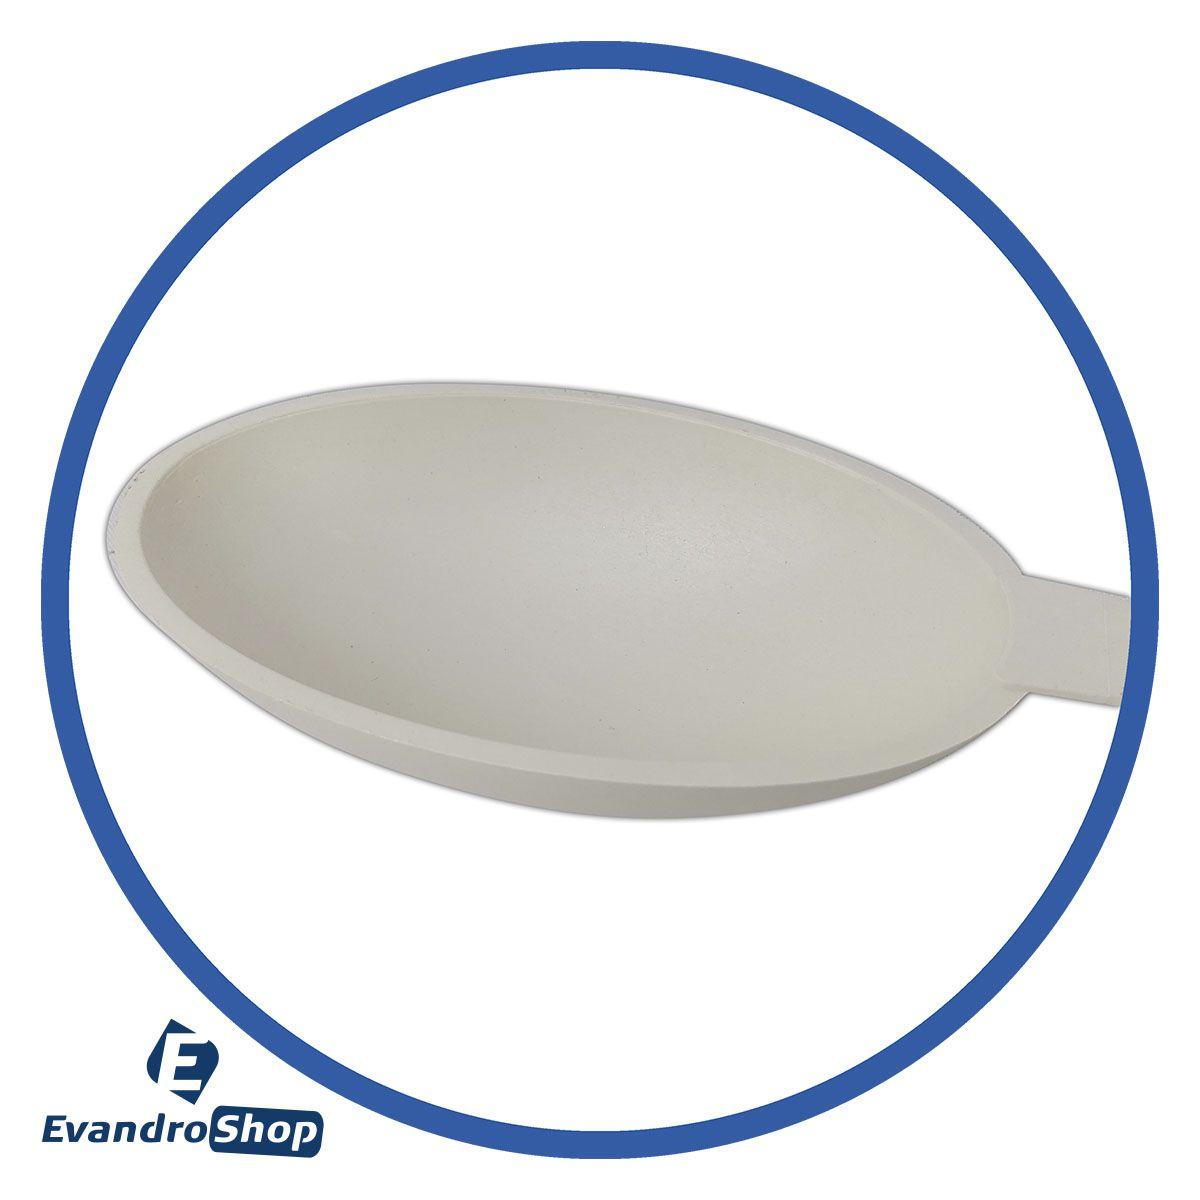 Colher Em Nylon Concova Funda Branca 70x10 Cm - Solrac